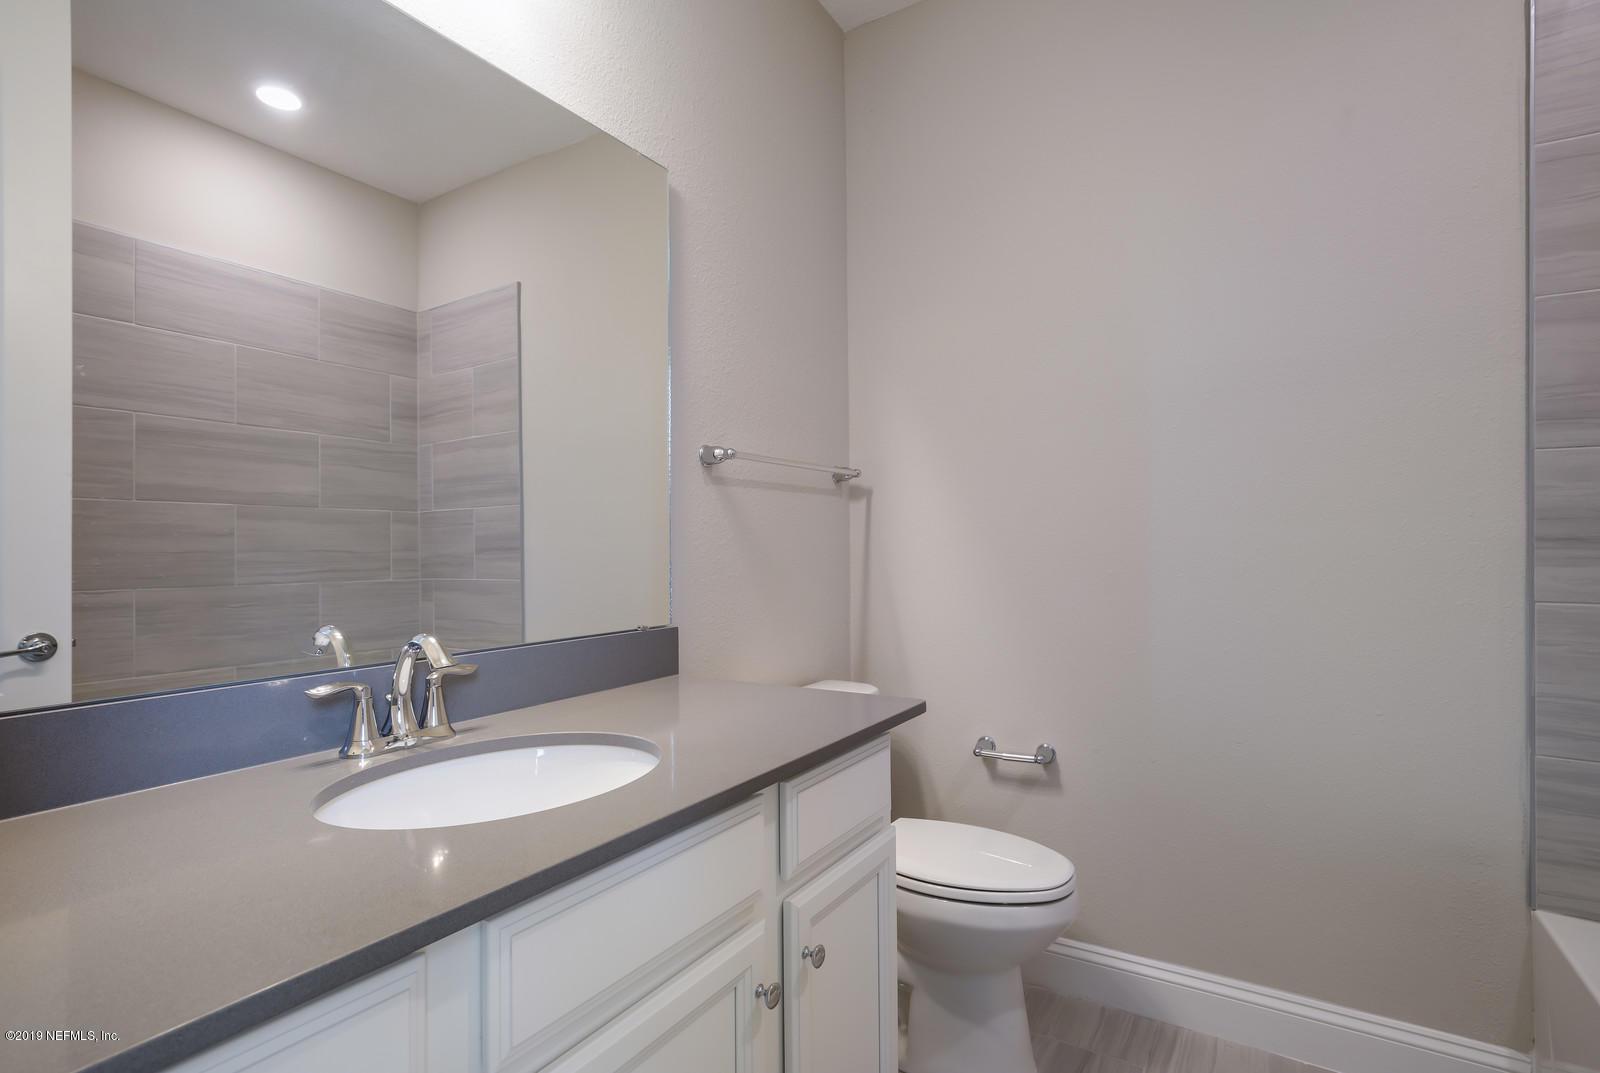 450 GLORIETA, ST AUGUSTINE, FLORIDA 32095, 4 Bedrooms Bedrooms, ,3 BathroomsBathrooms,Residential - single family,For sale,GLORIETA,1003429